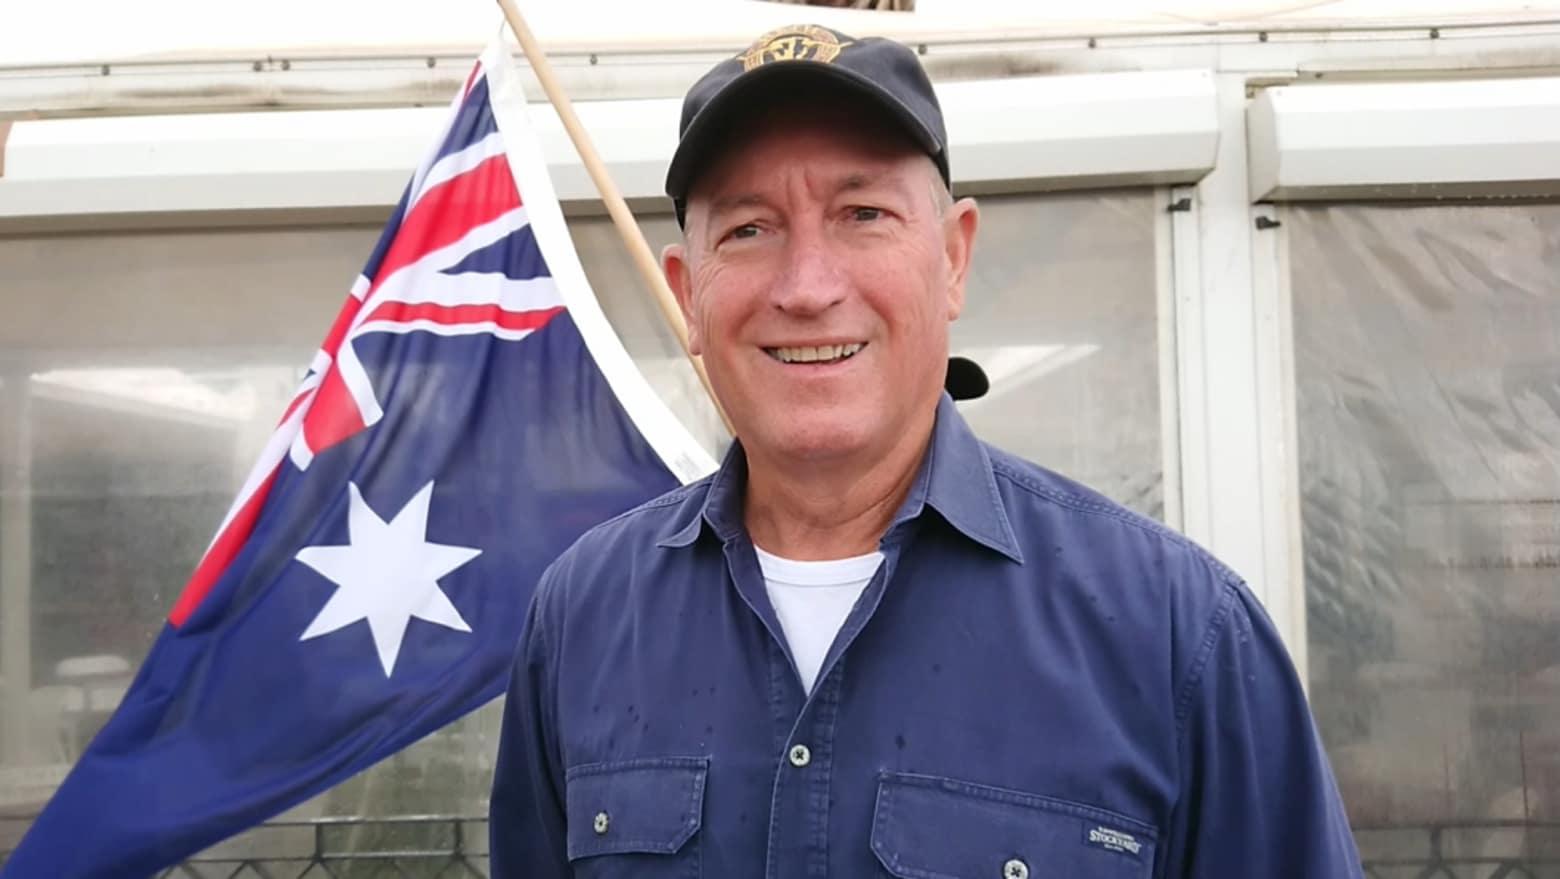 On the fringe: Queensland senator Fraser Anning at the St Kilda rally. Credit:AAP